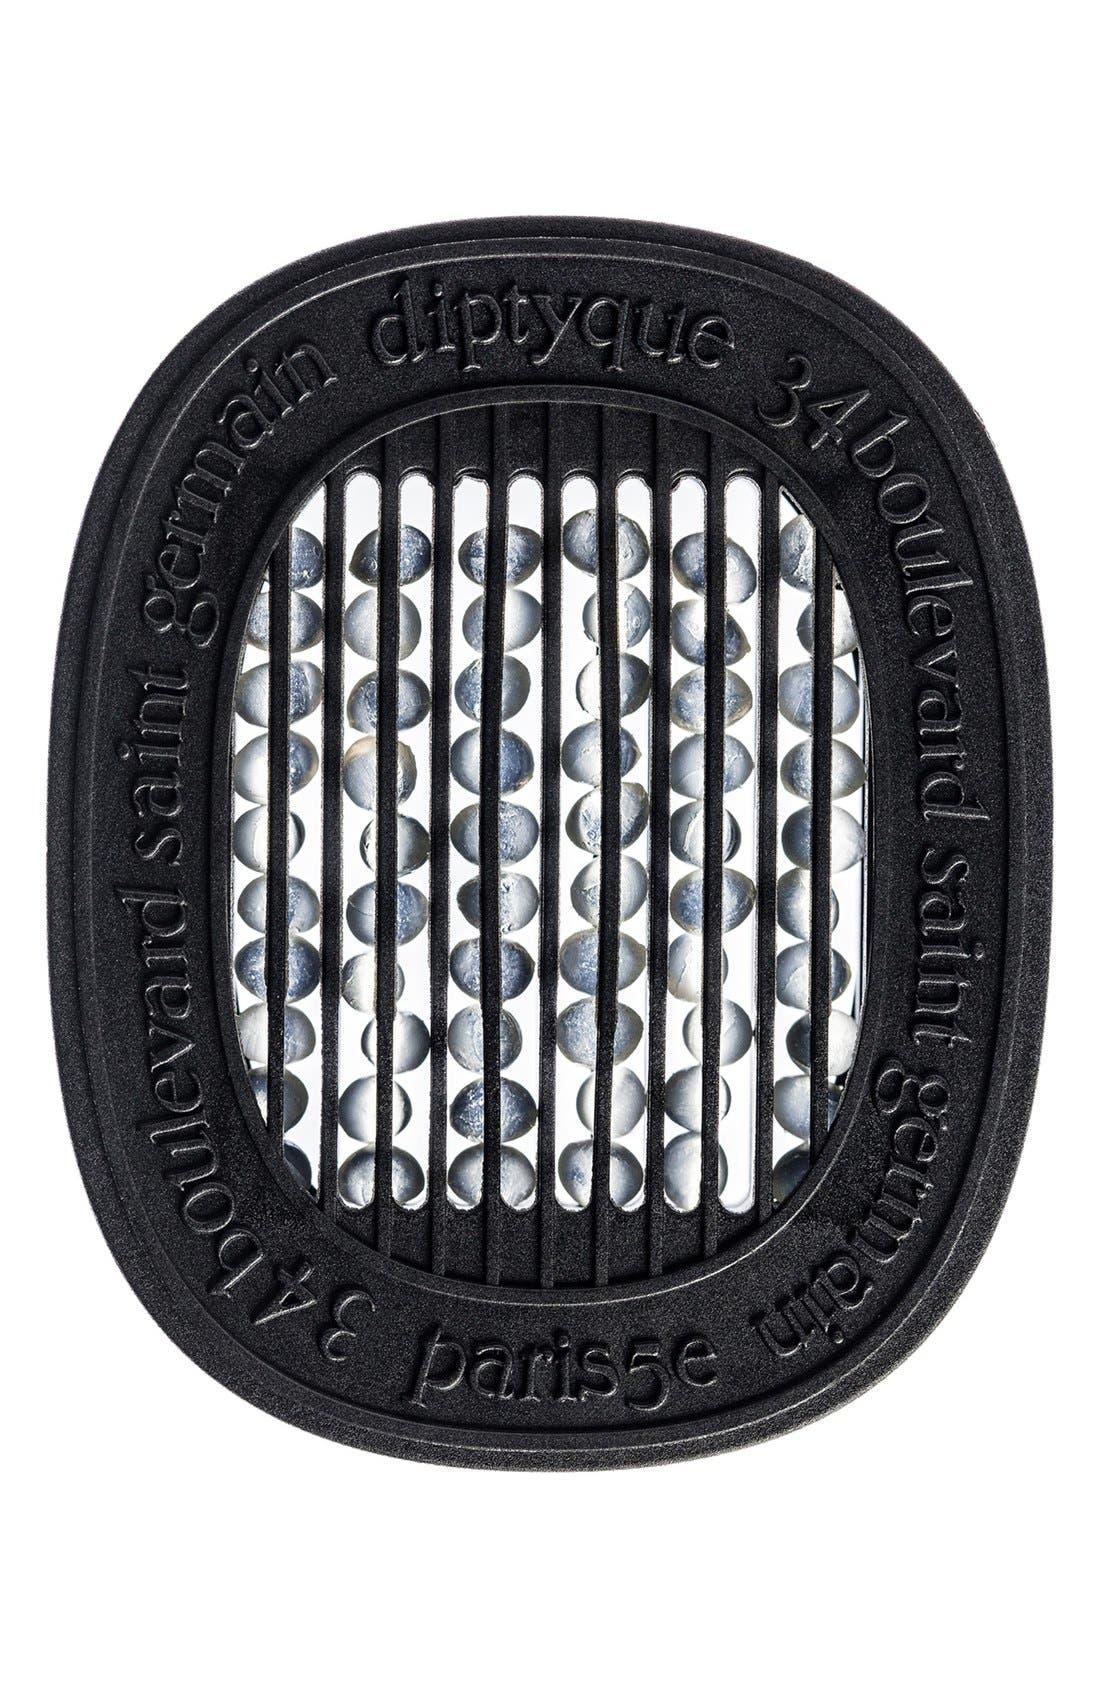 Main Image - diptyque Baies/Berries Electric Diffuser Cartridge